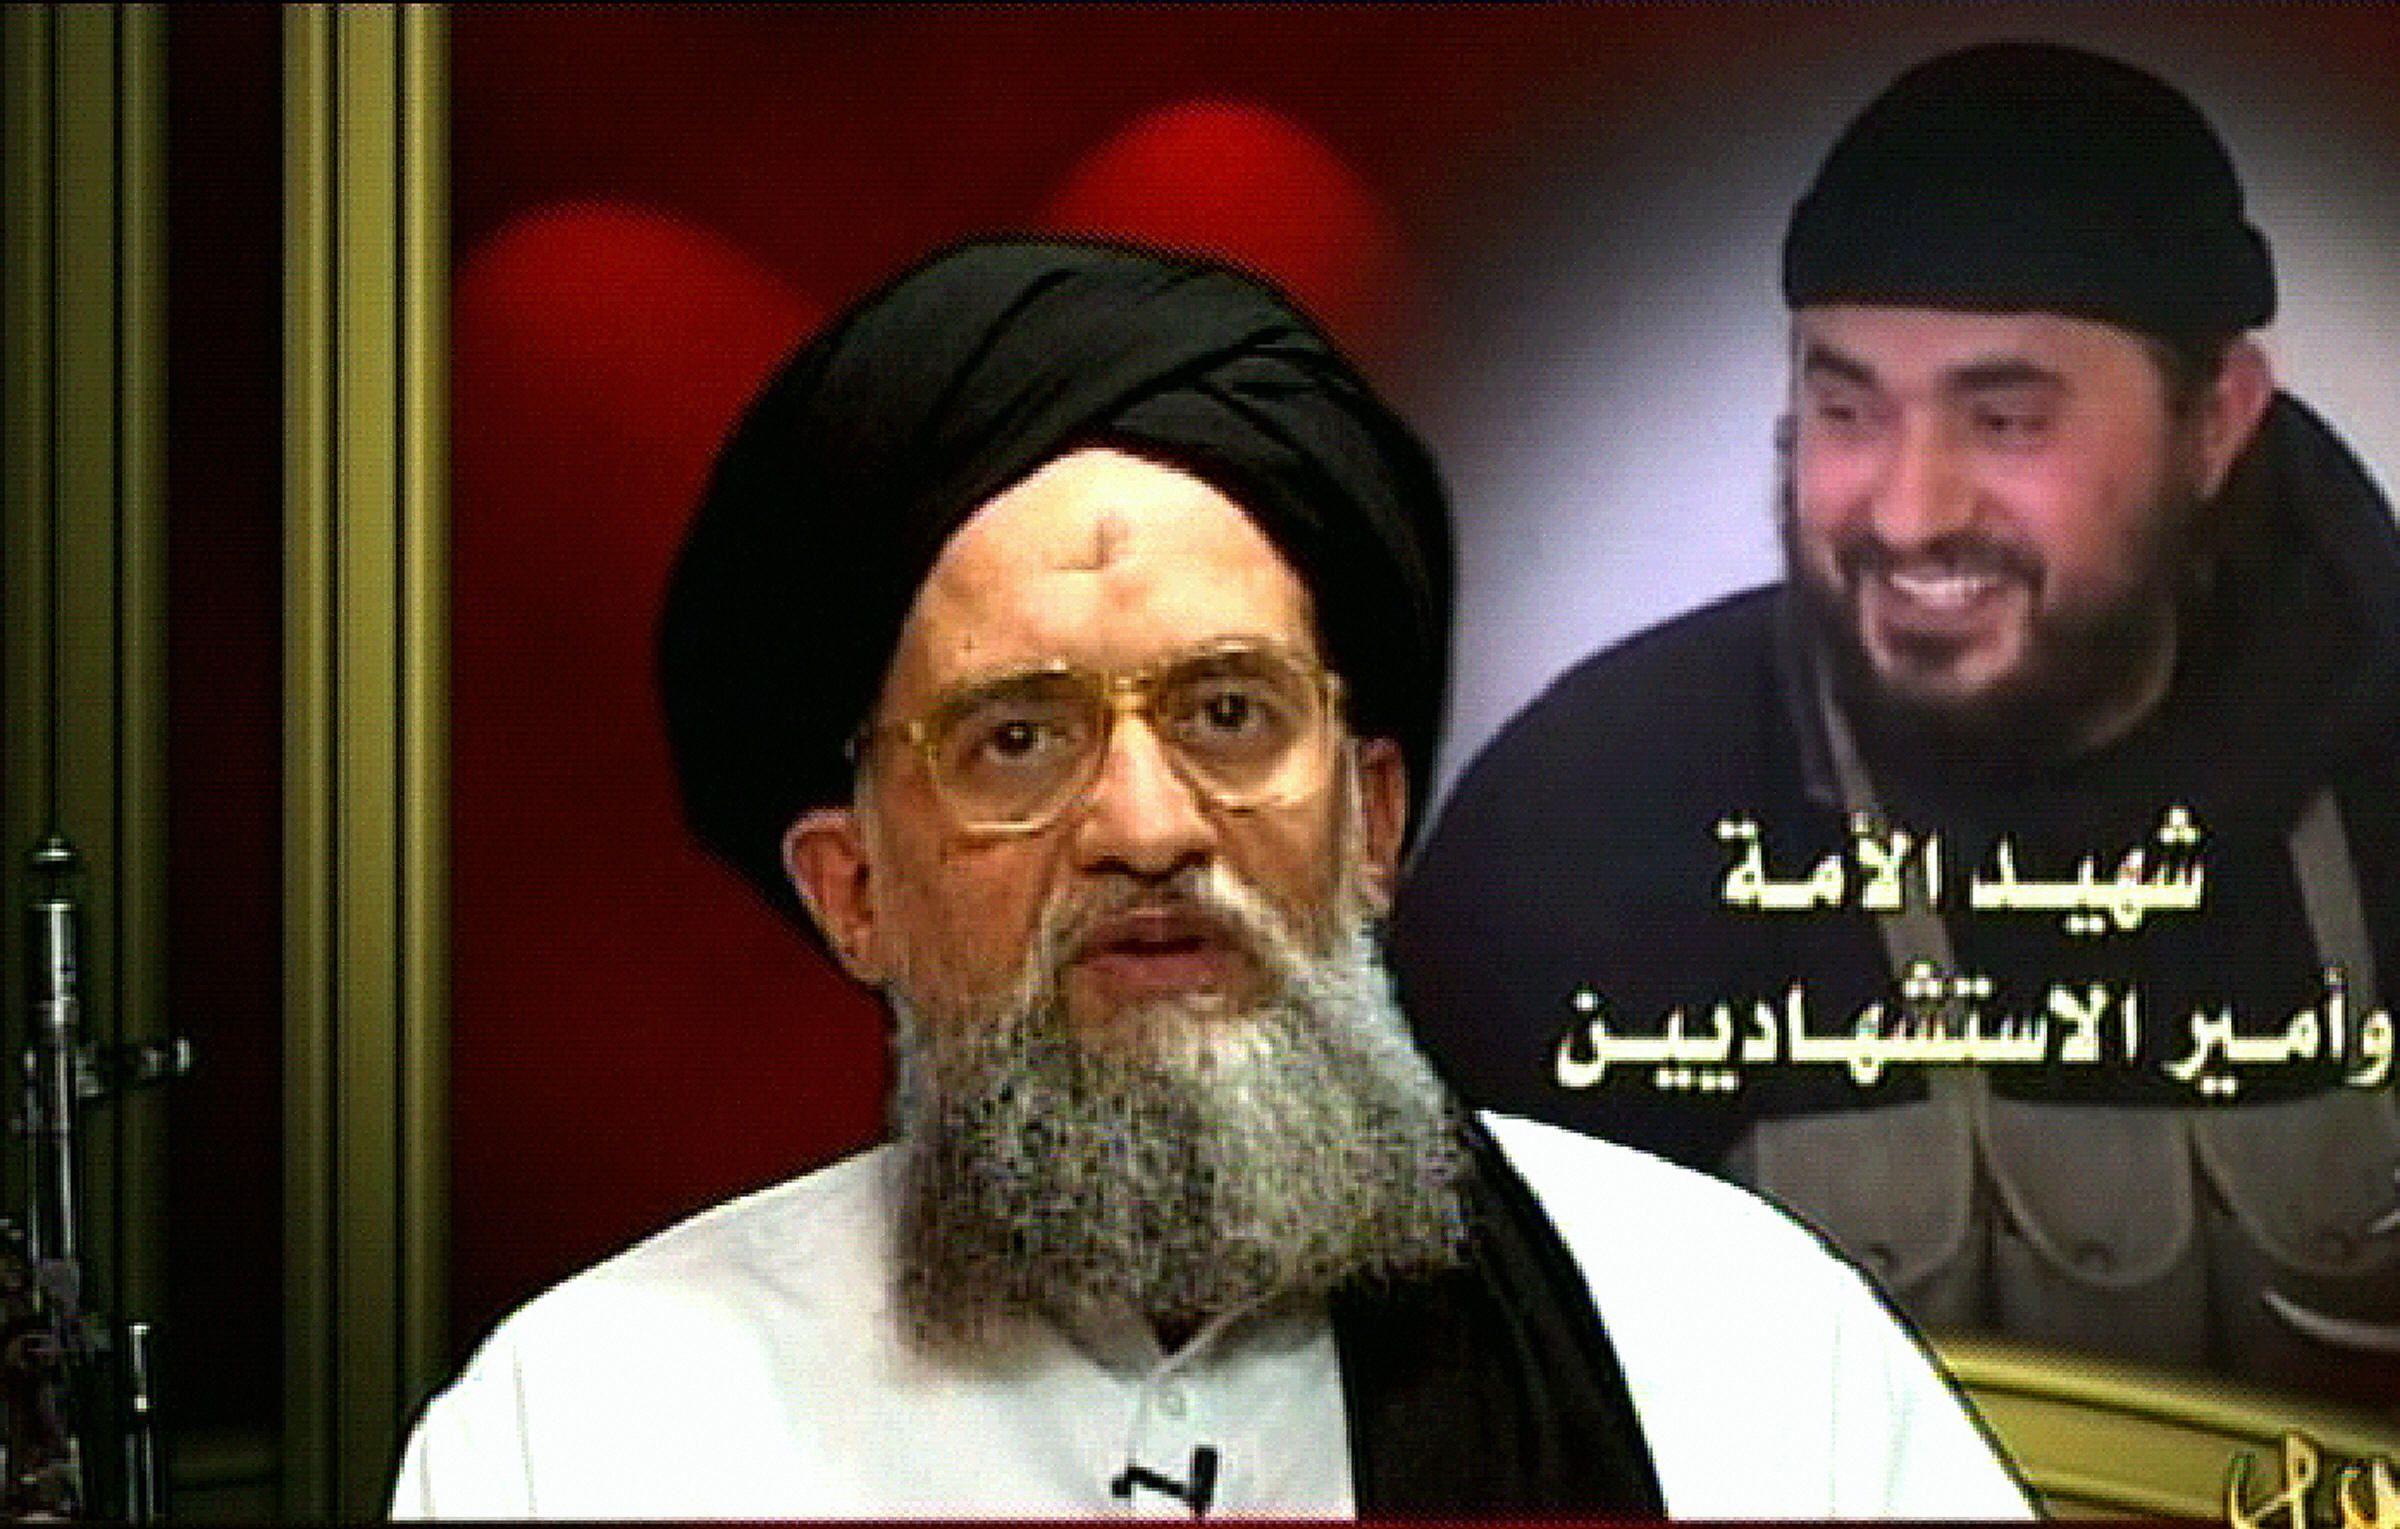 Al-Qaeda's Ayman al-Zawahiri